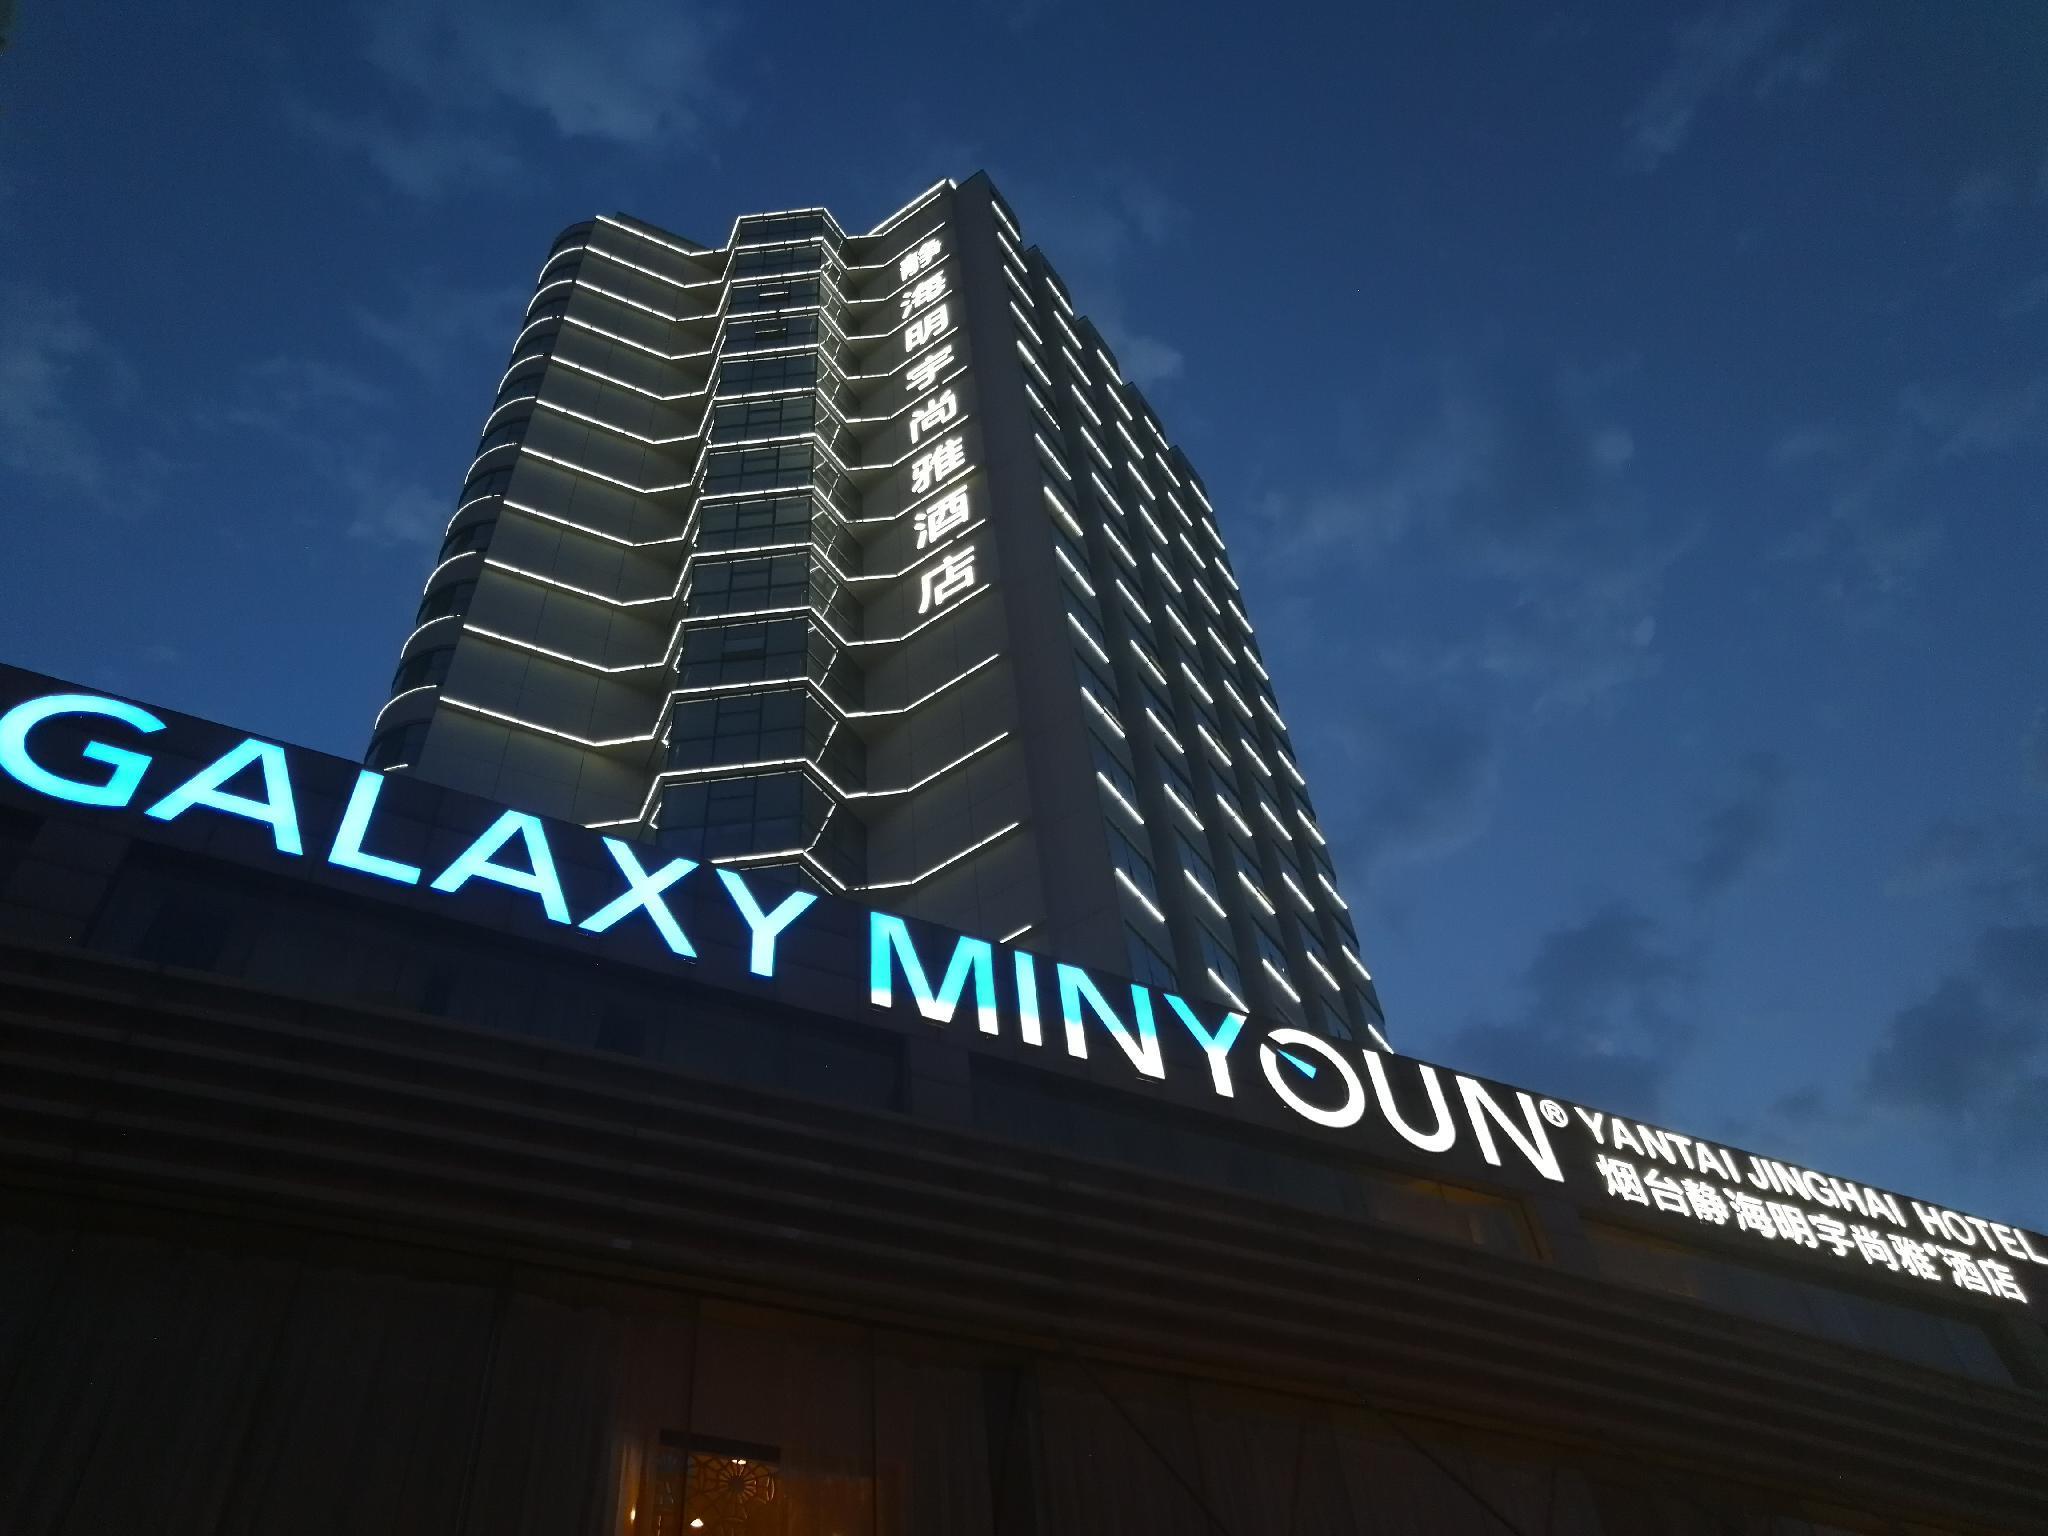 Galaxy Minyoun Yantai Jinghai Hotel